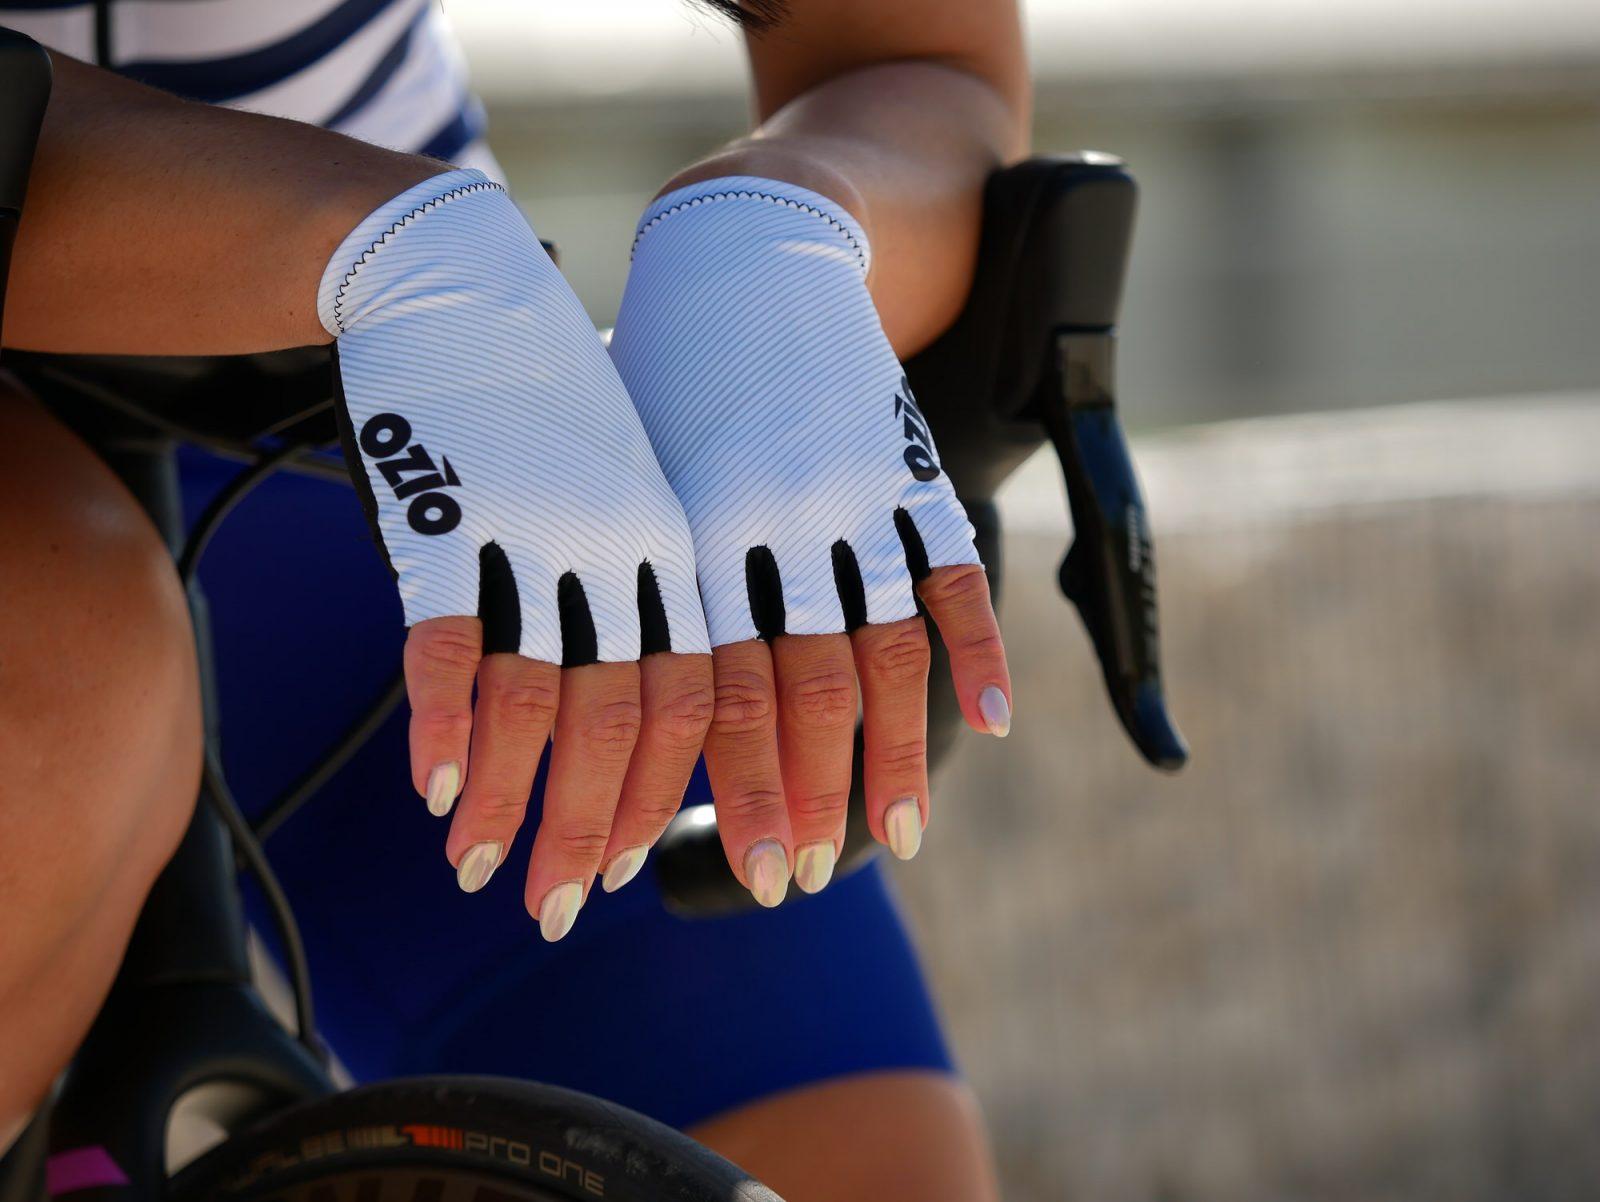 Mitaines de vélo blanches OZIO